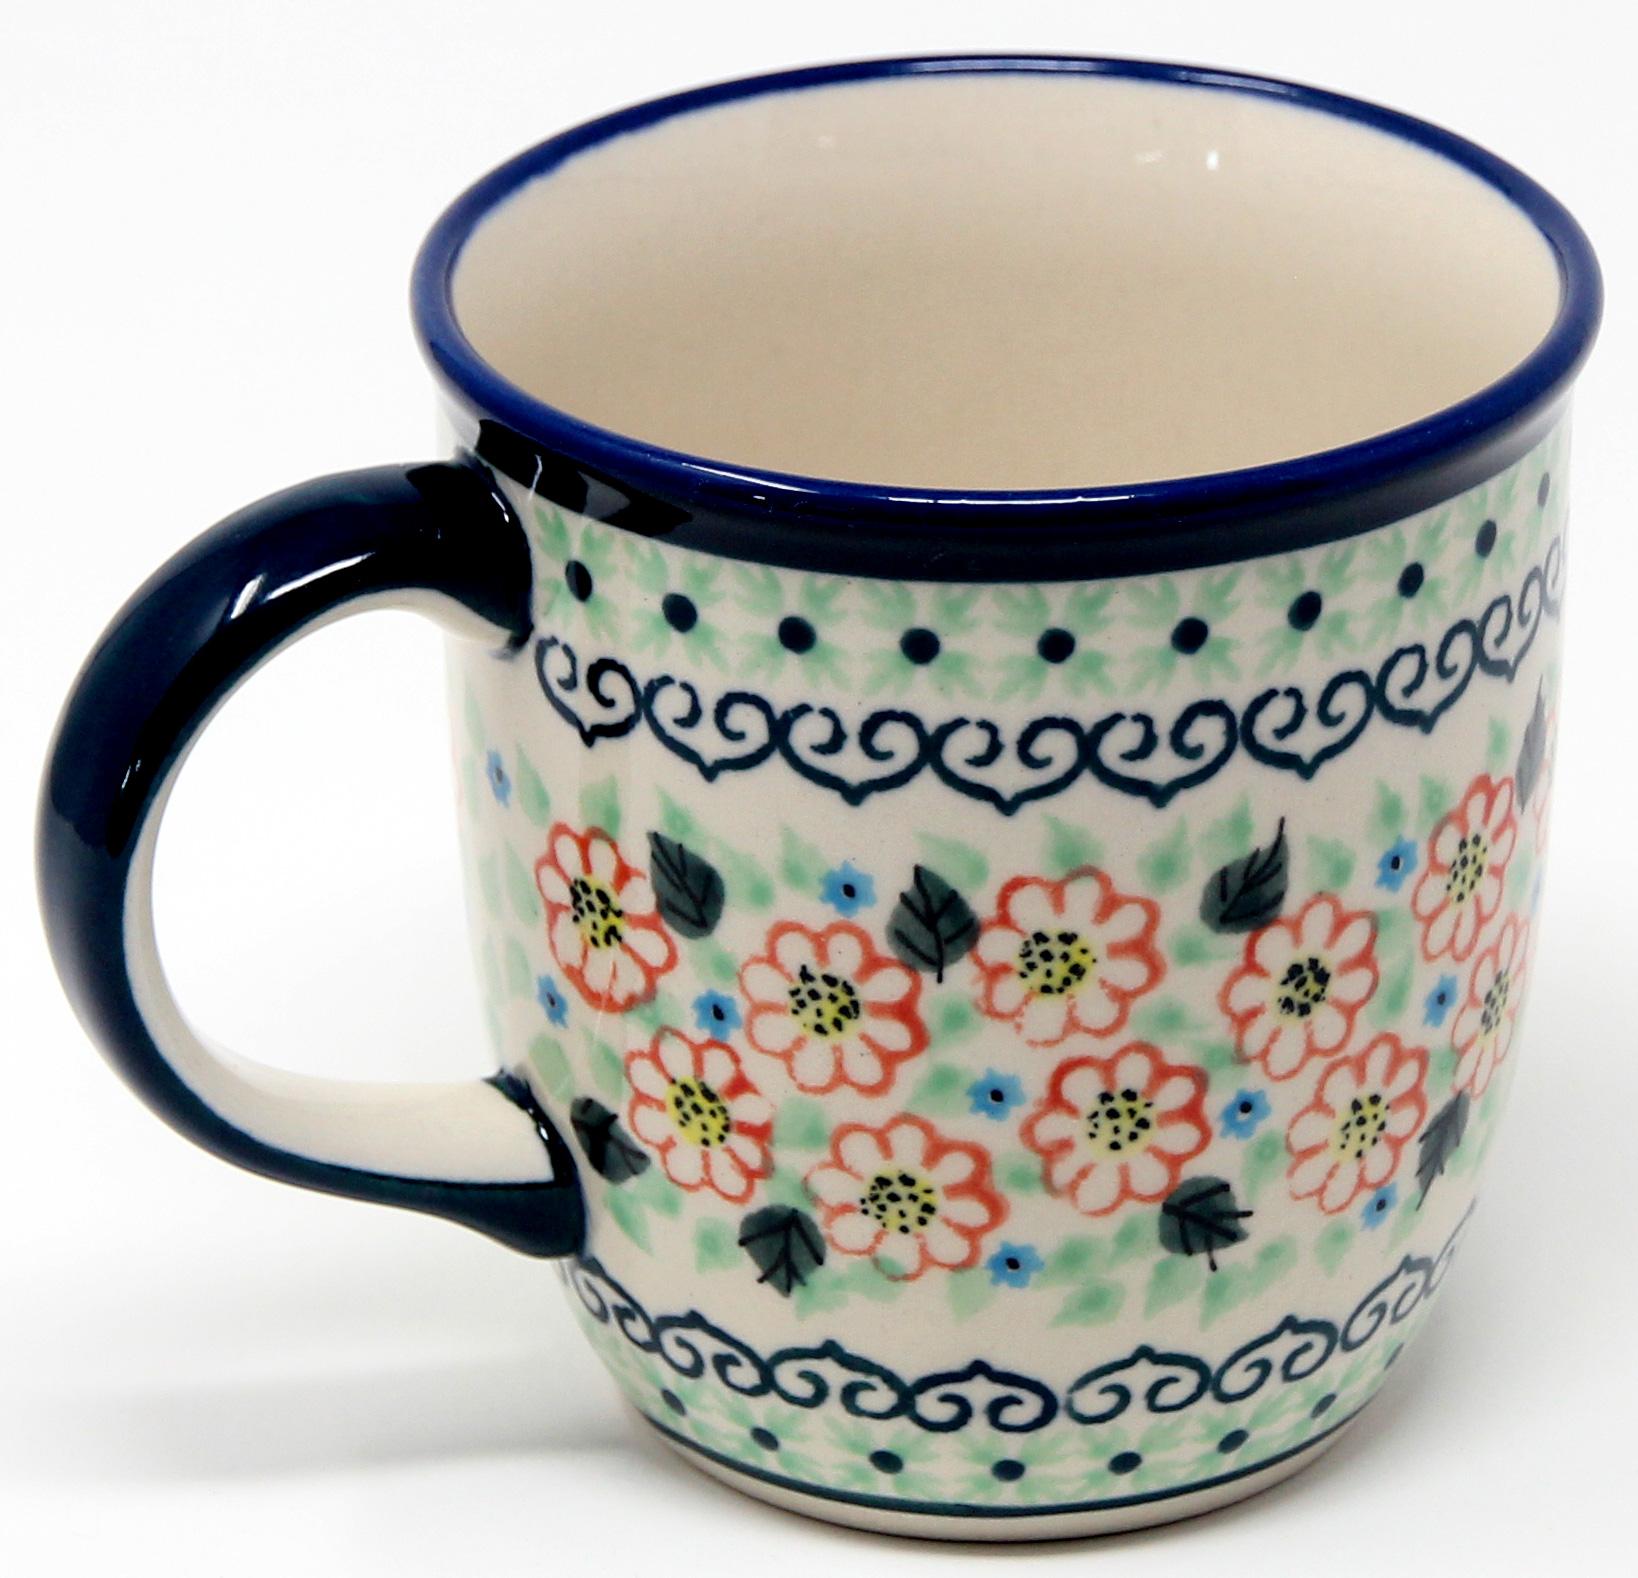 Mug 12 Oz Polish Pottery In 227art A Unikat Signature Pattern 12 Ounce Mugs Polish Pottery Mugs Polish Pottery Market